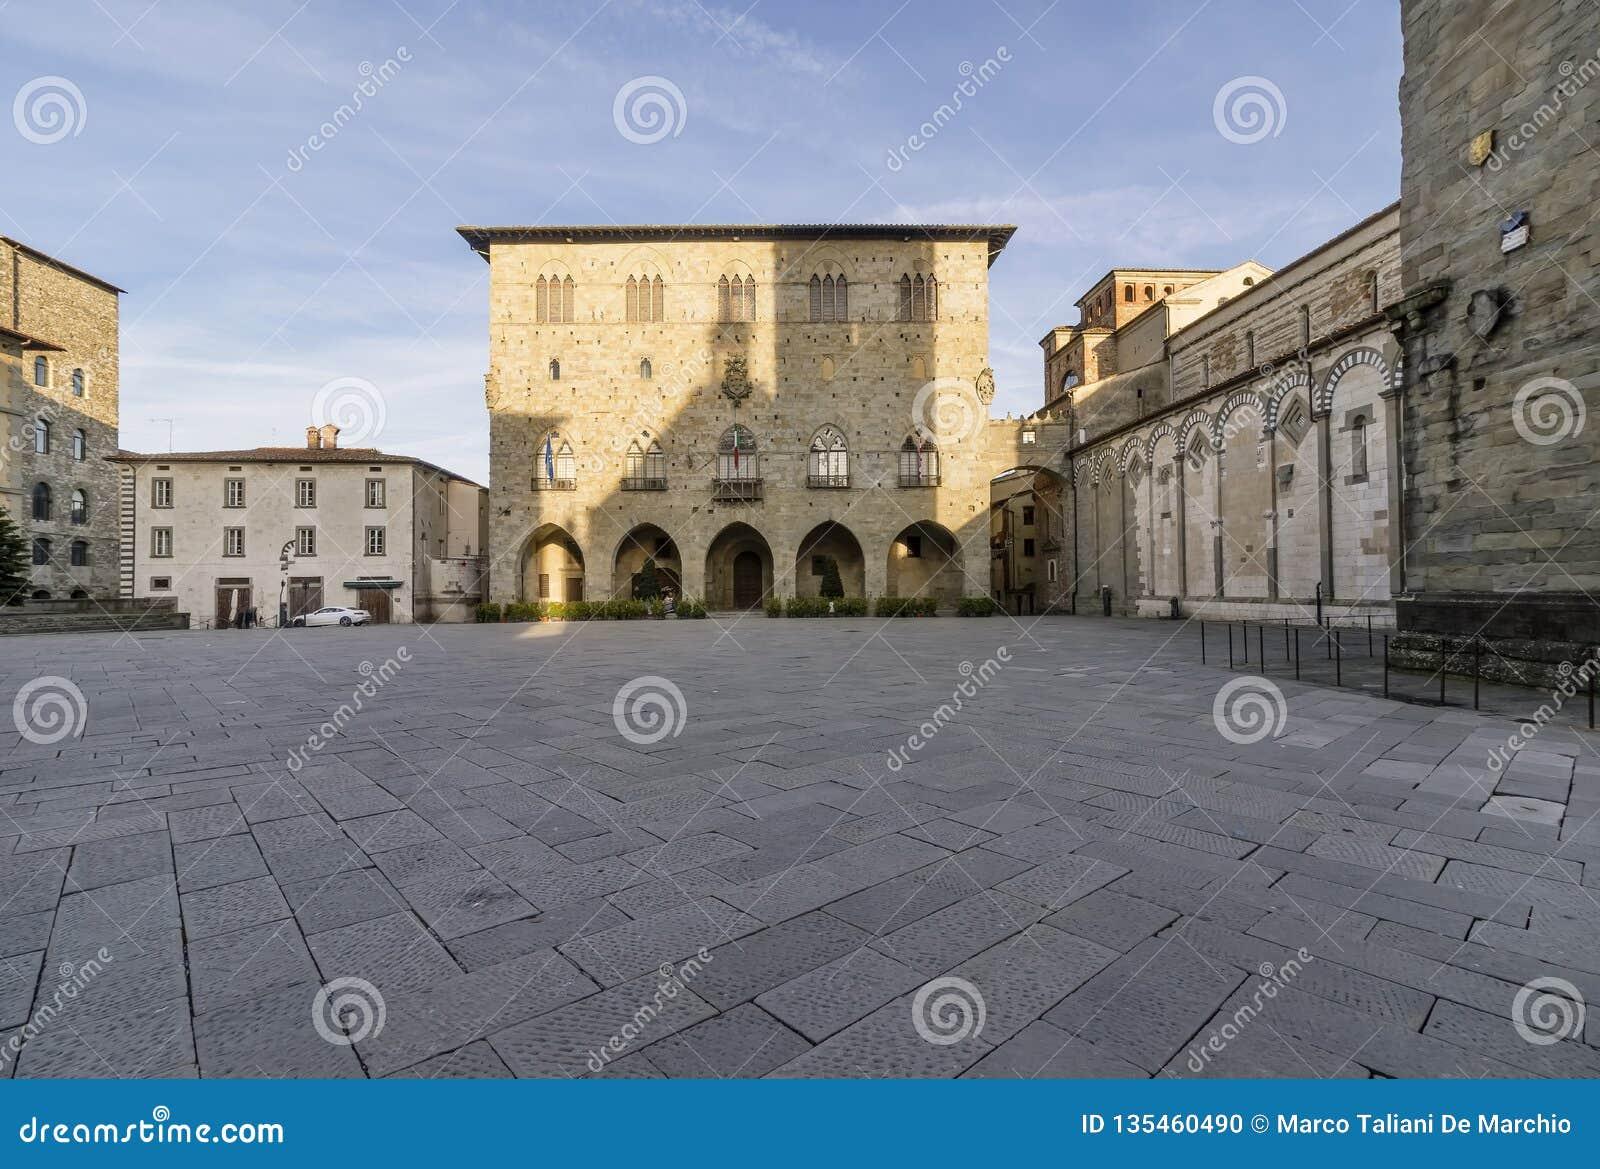 Piazza Del Duomo i Palazzo Del Comune bez ludzi w Pistoia, Tuscany, Włochy